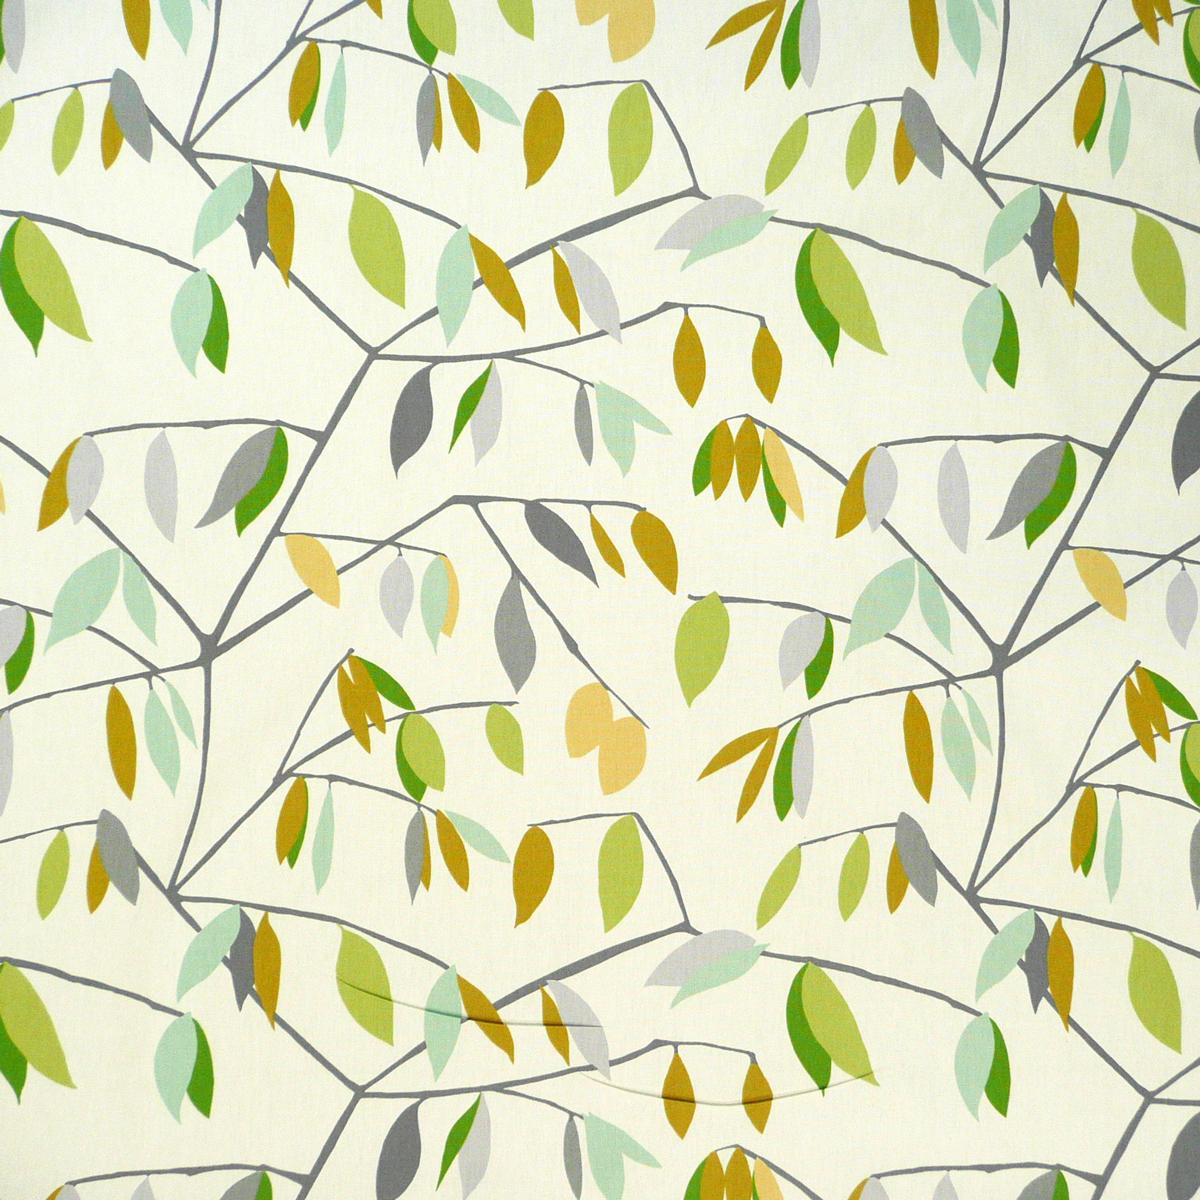 Dekostoff Coco Plum Lemonade Blätter grau grün gelb 137cm